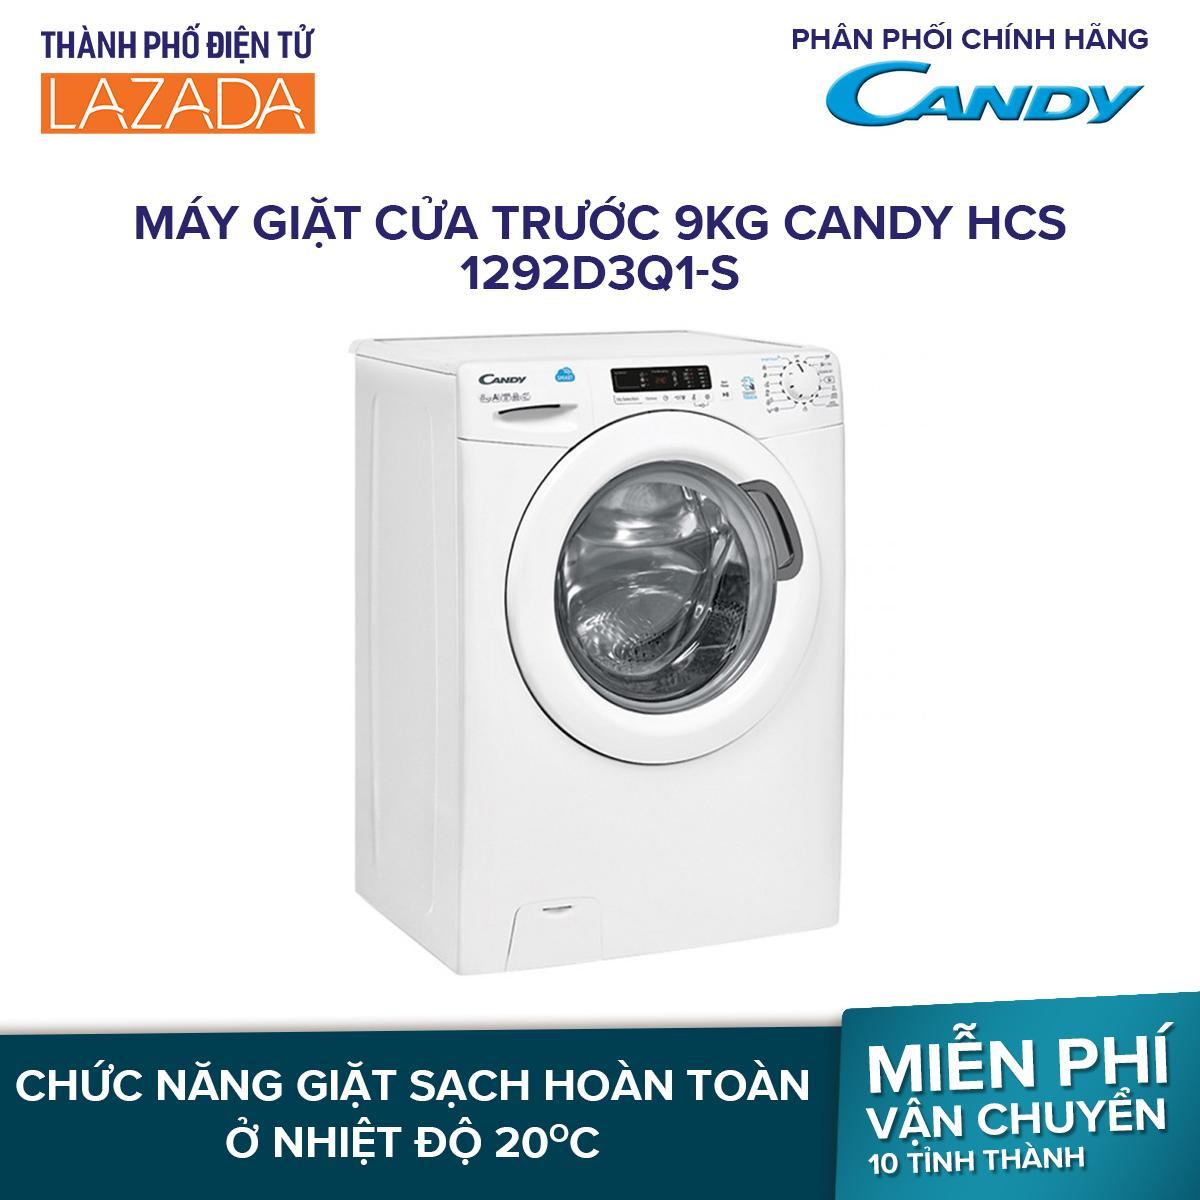 Máy giặt cửa trước Candy 9kg HCS 1292D3Q/1-S